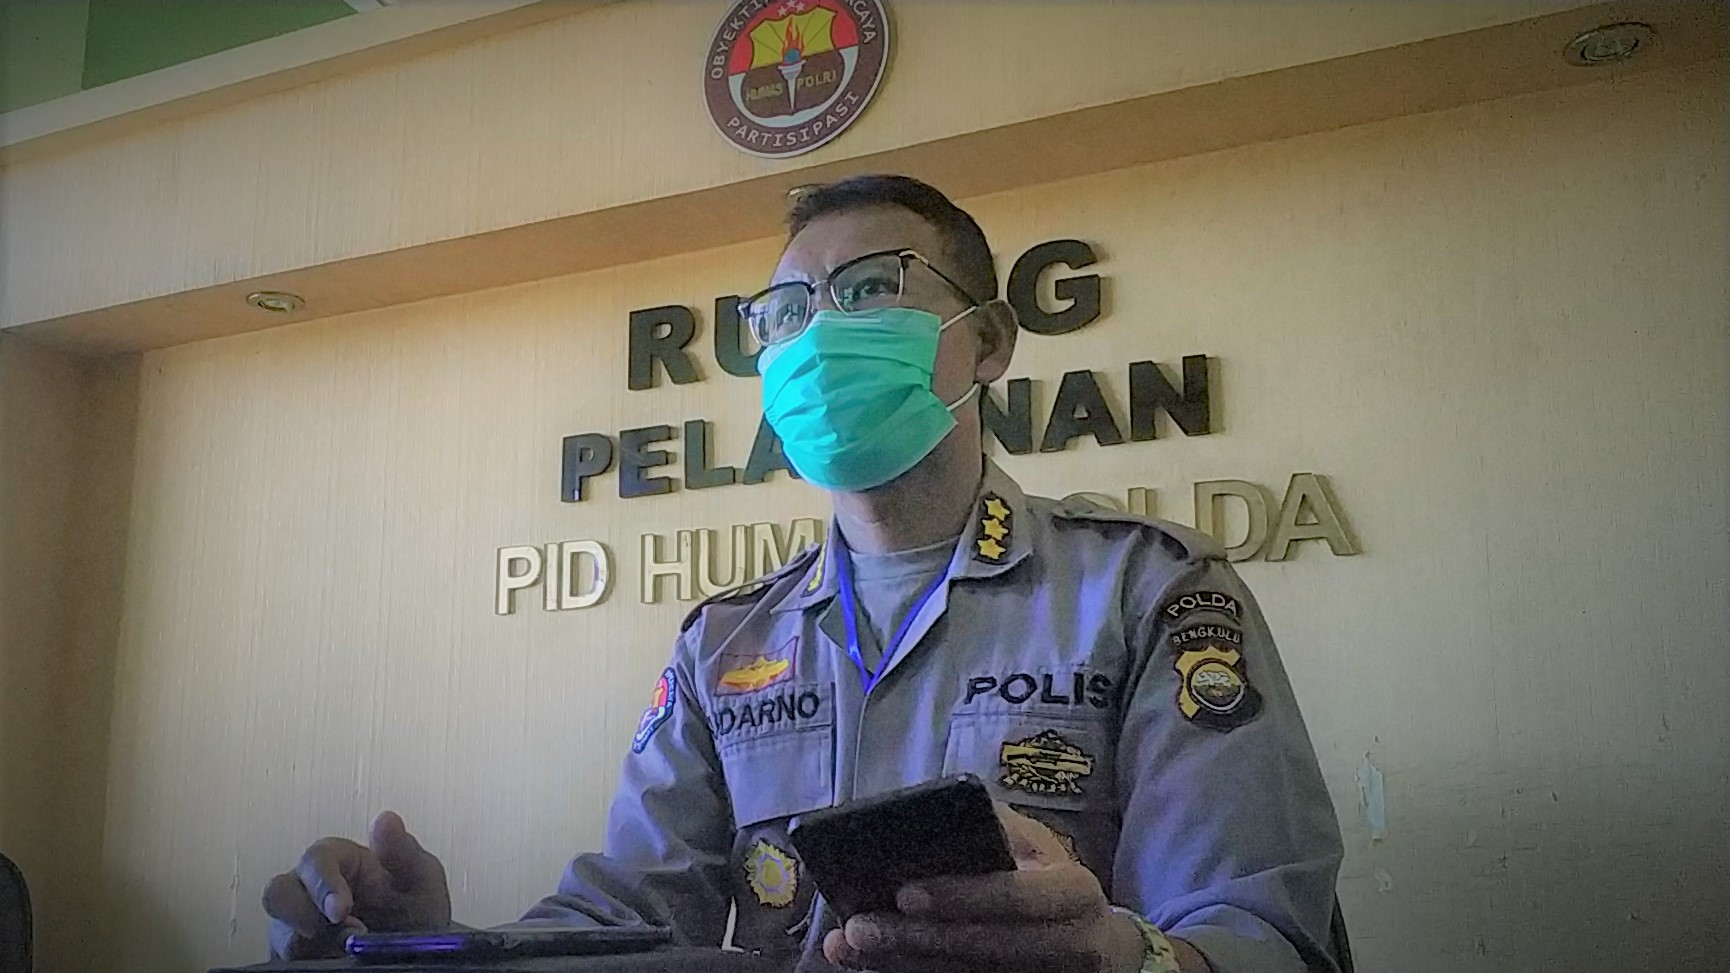 Hari Ketiga Operasi Yustisi, Personil Gabungan Beri 47.754 Teguran